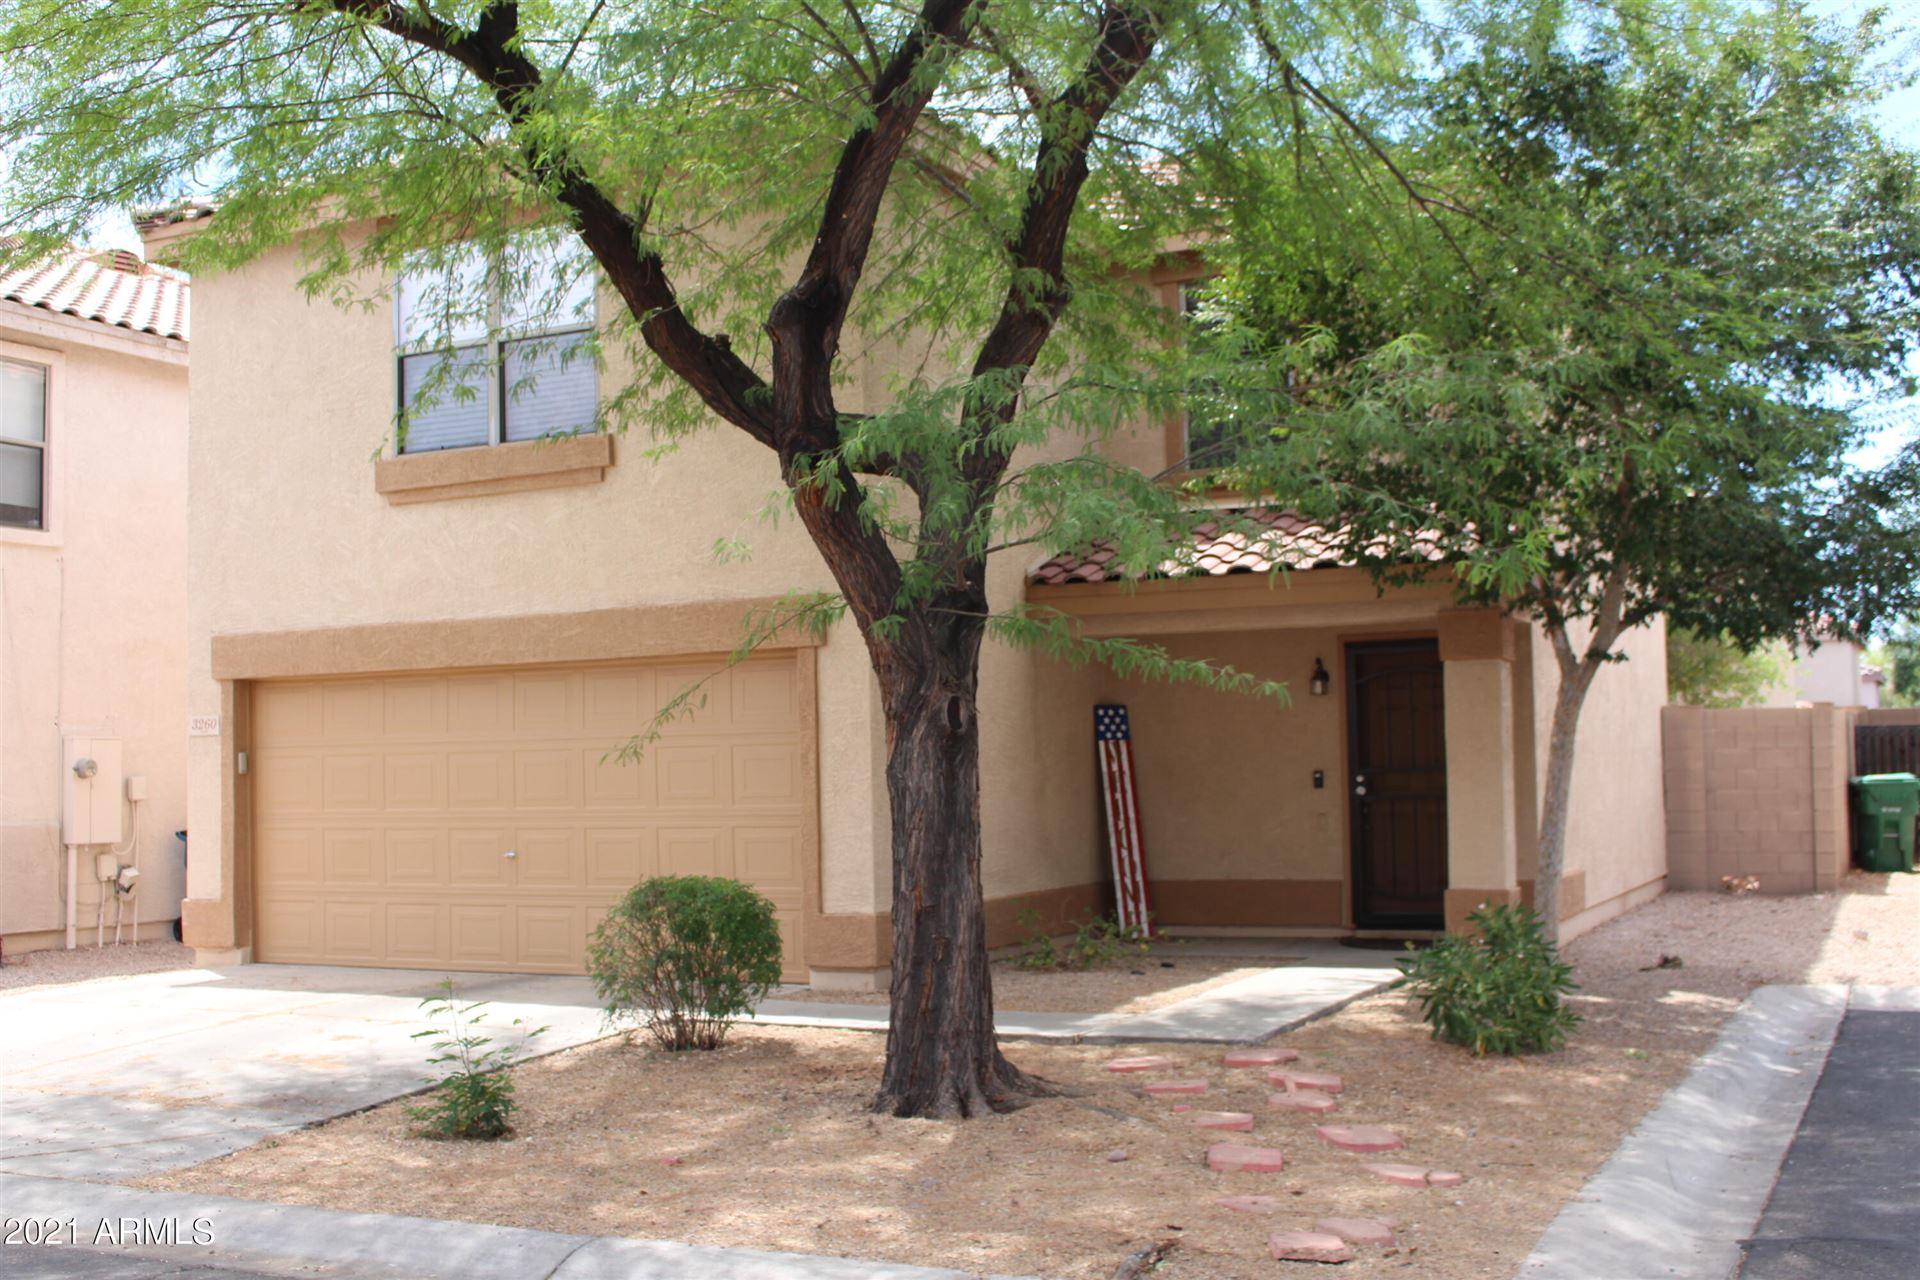 Photo of 3260 S CONESTOGA Road, Apache Junction, AZ 85119 (MLS # 6248164)